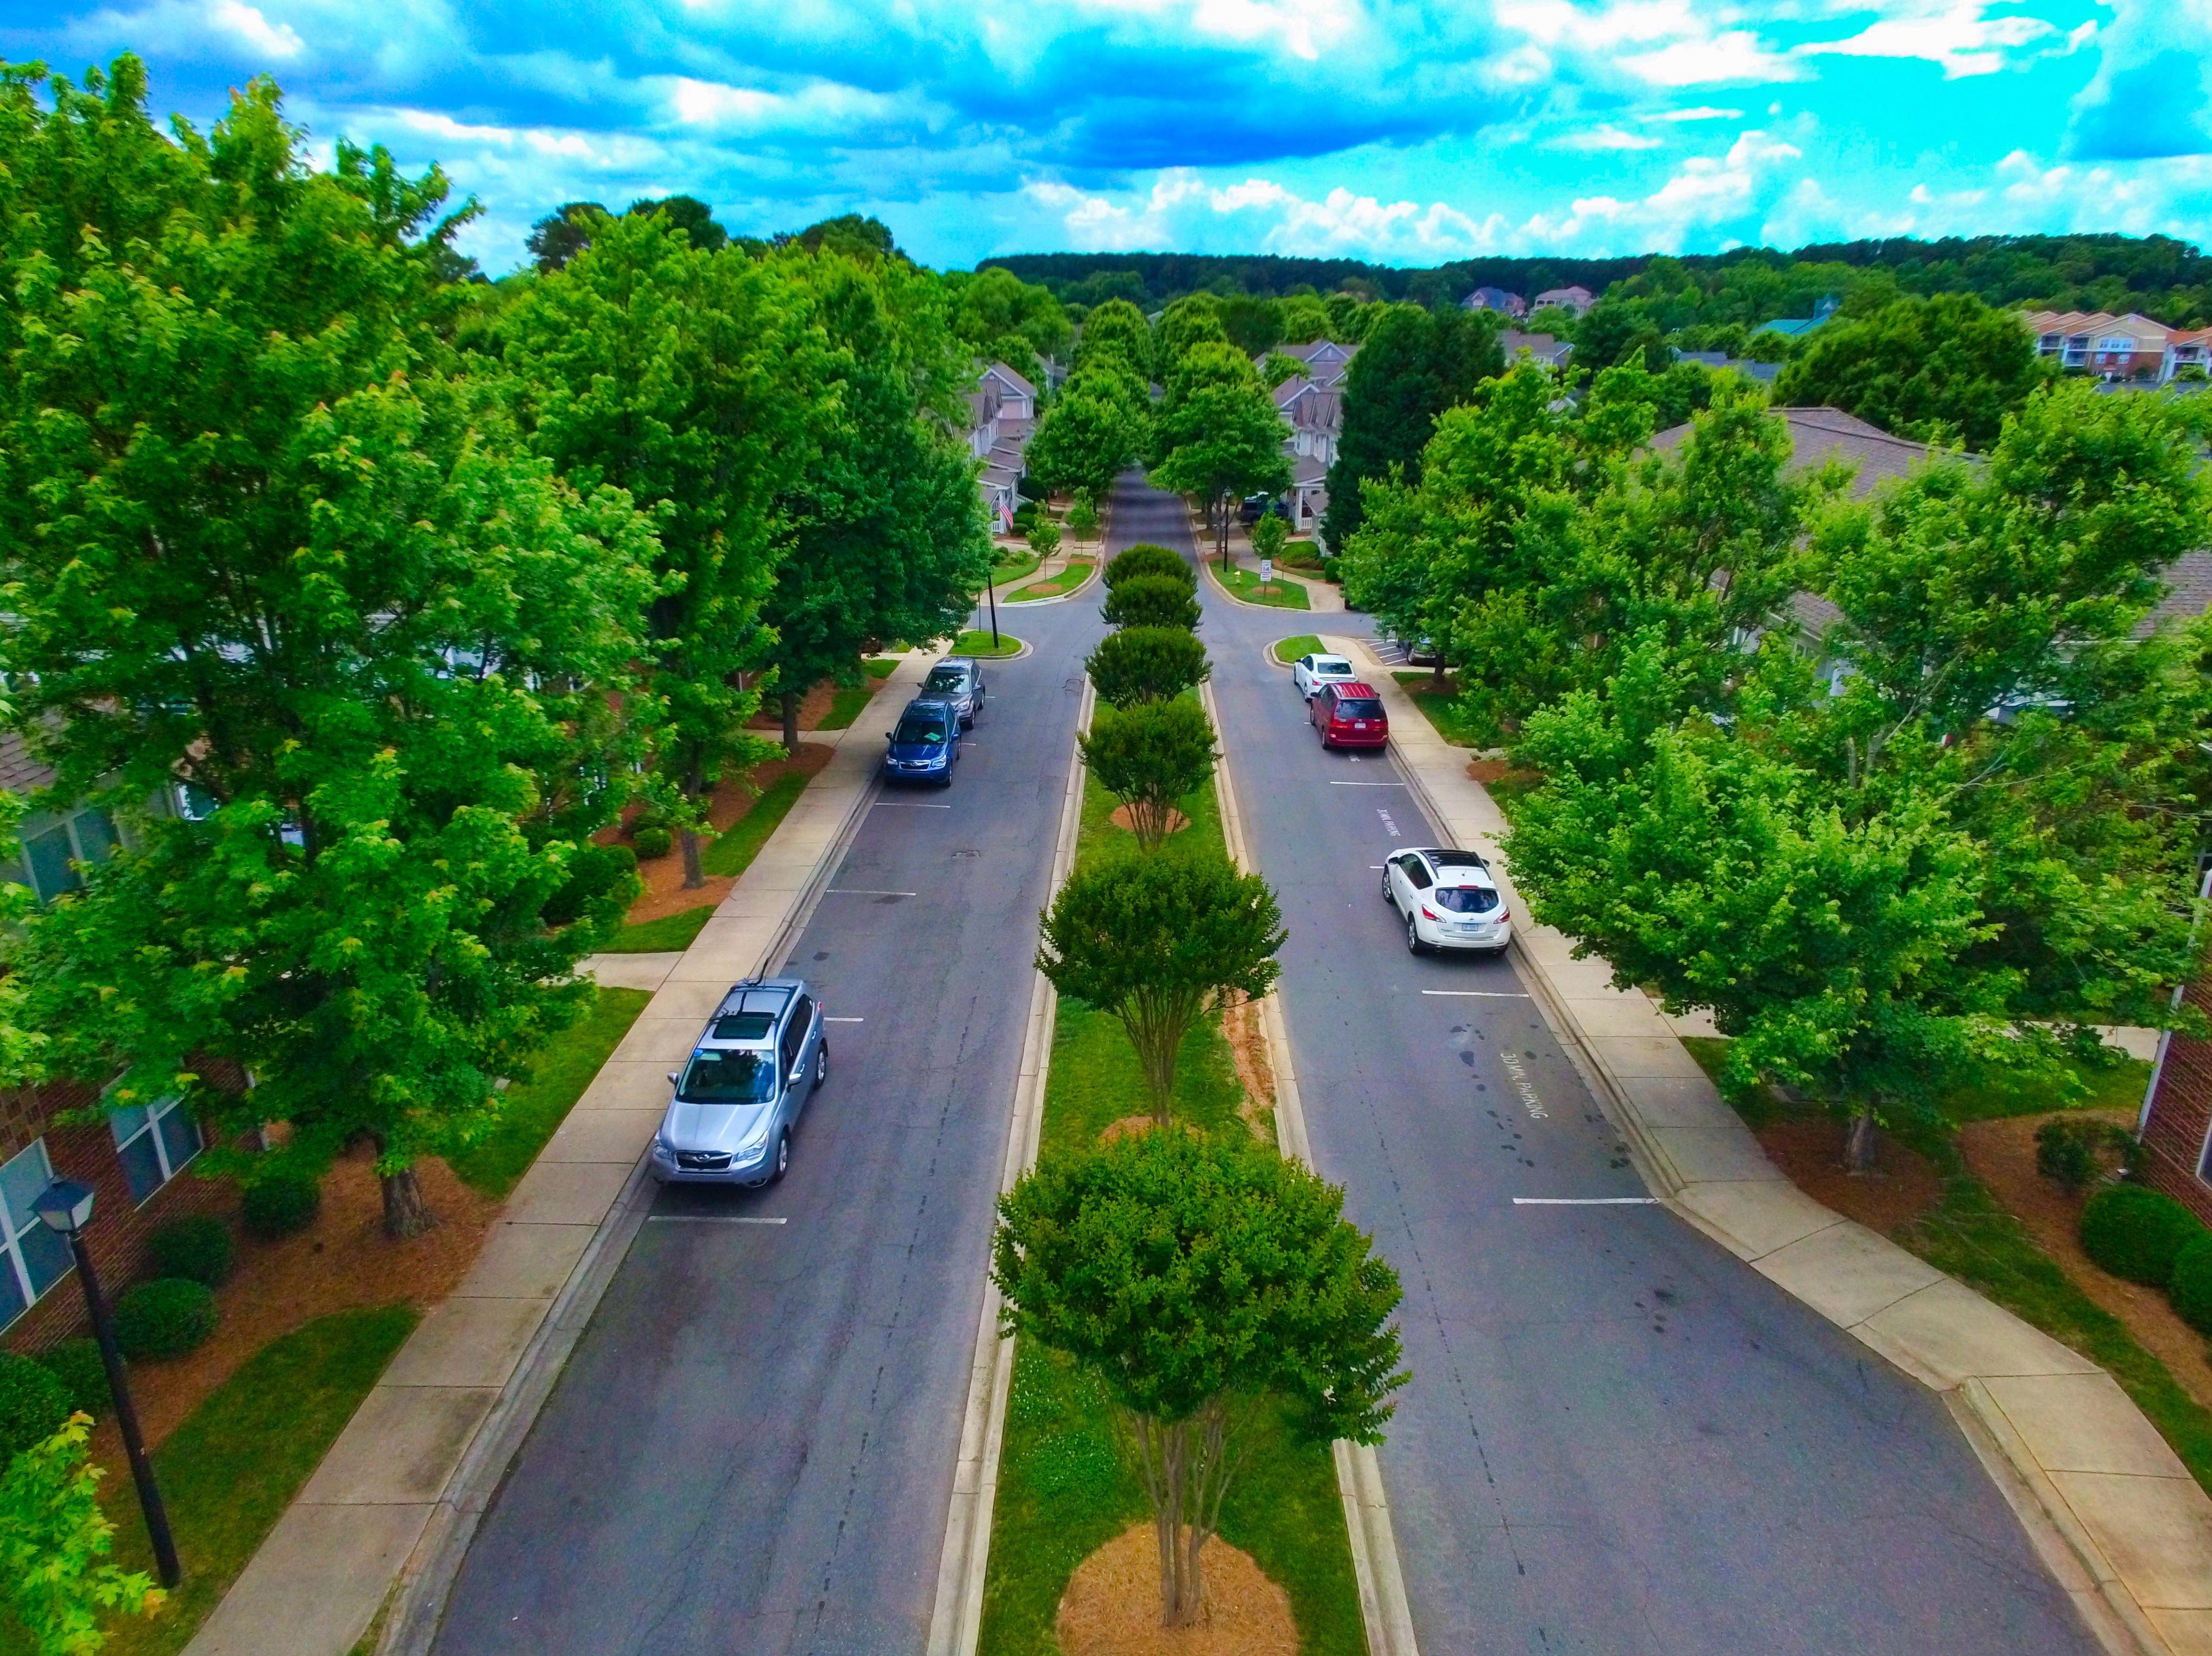 Harborside Avenue